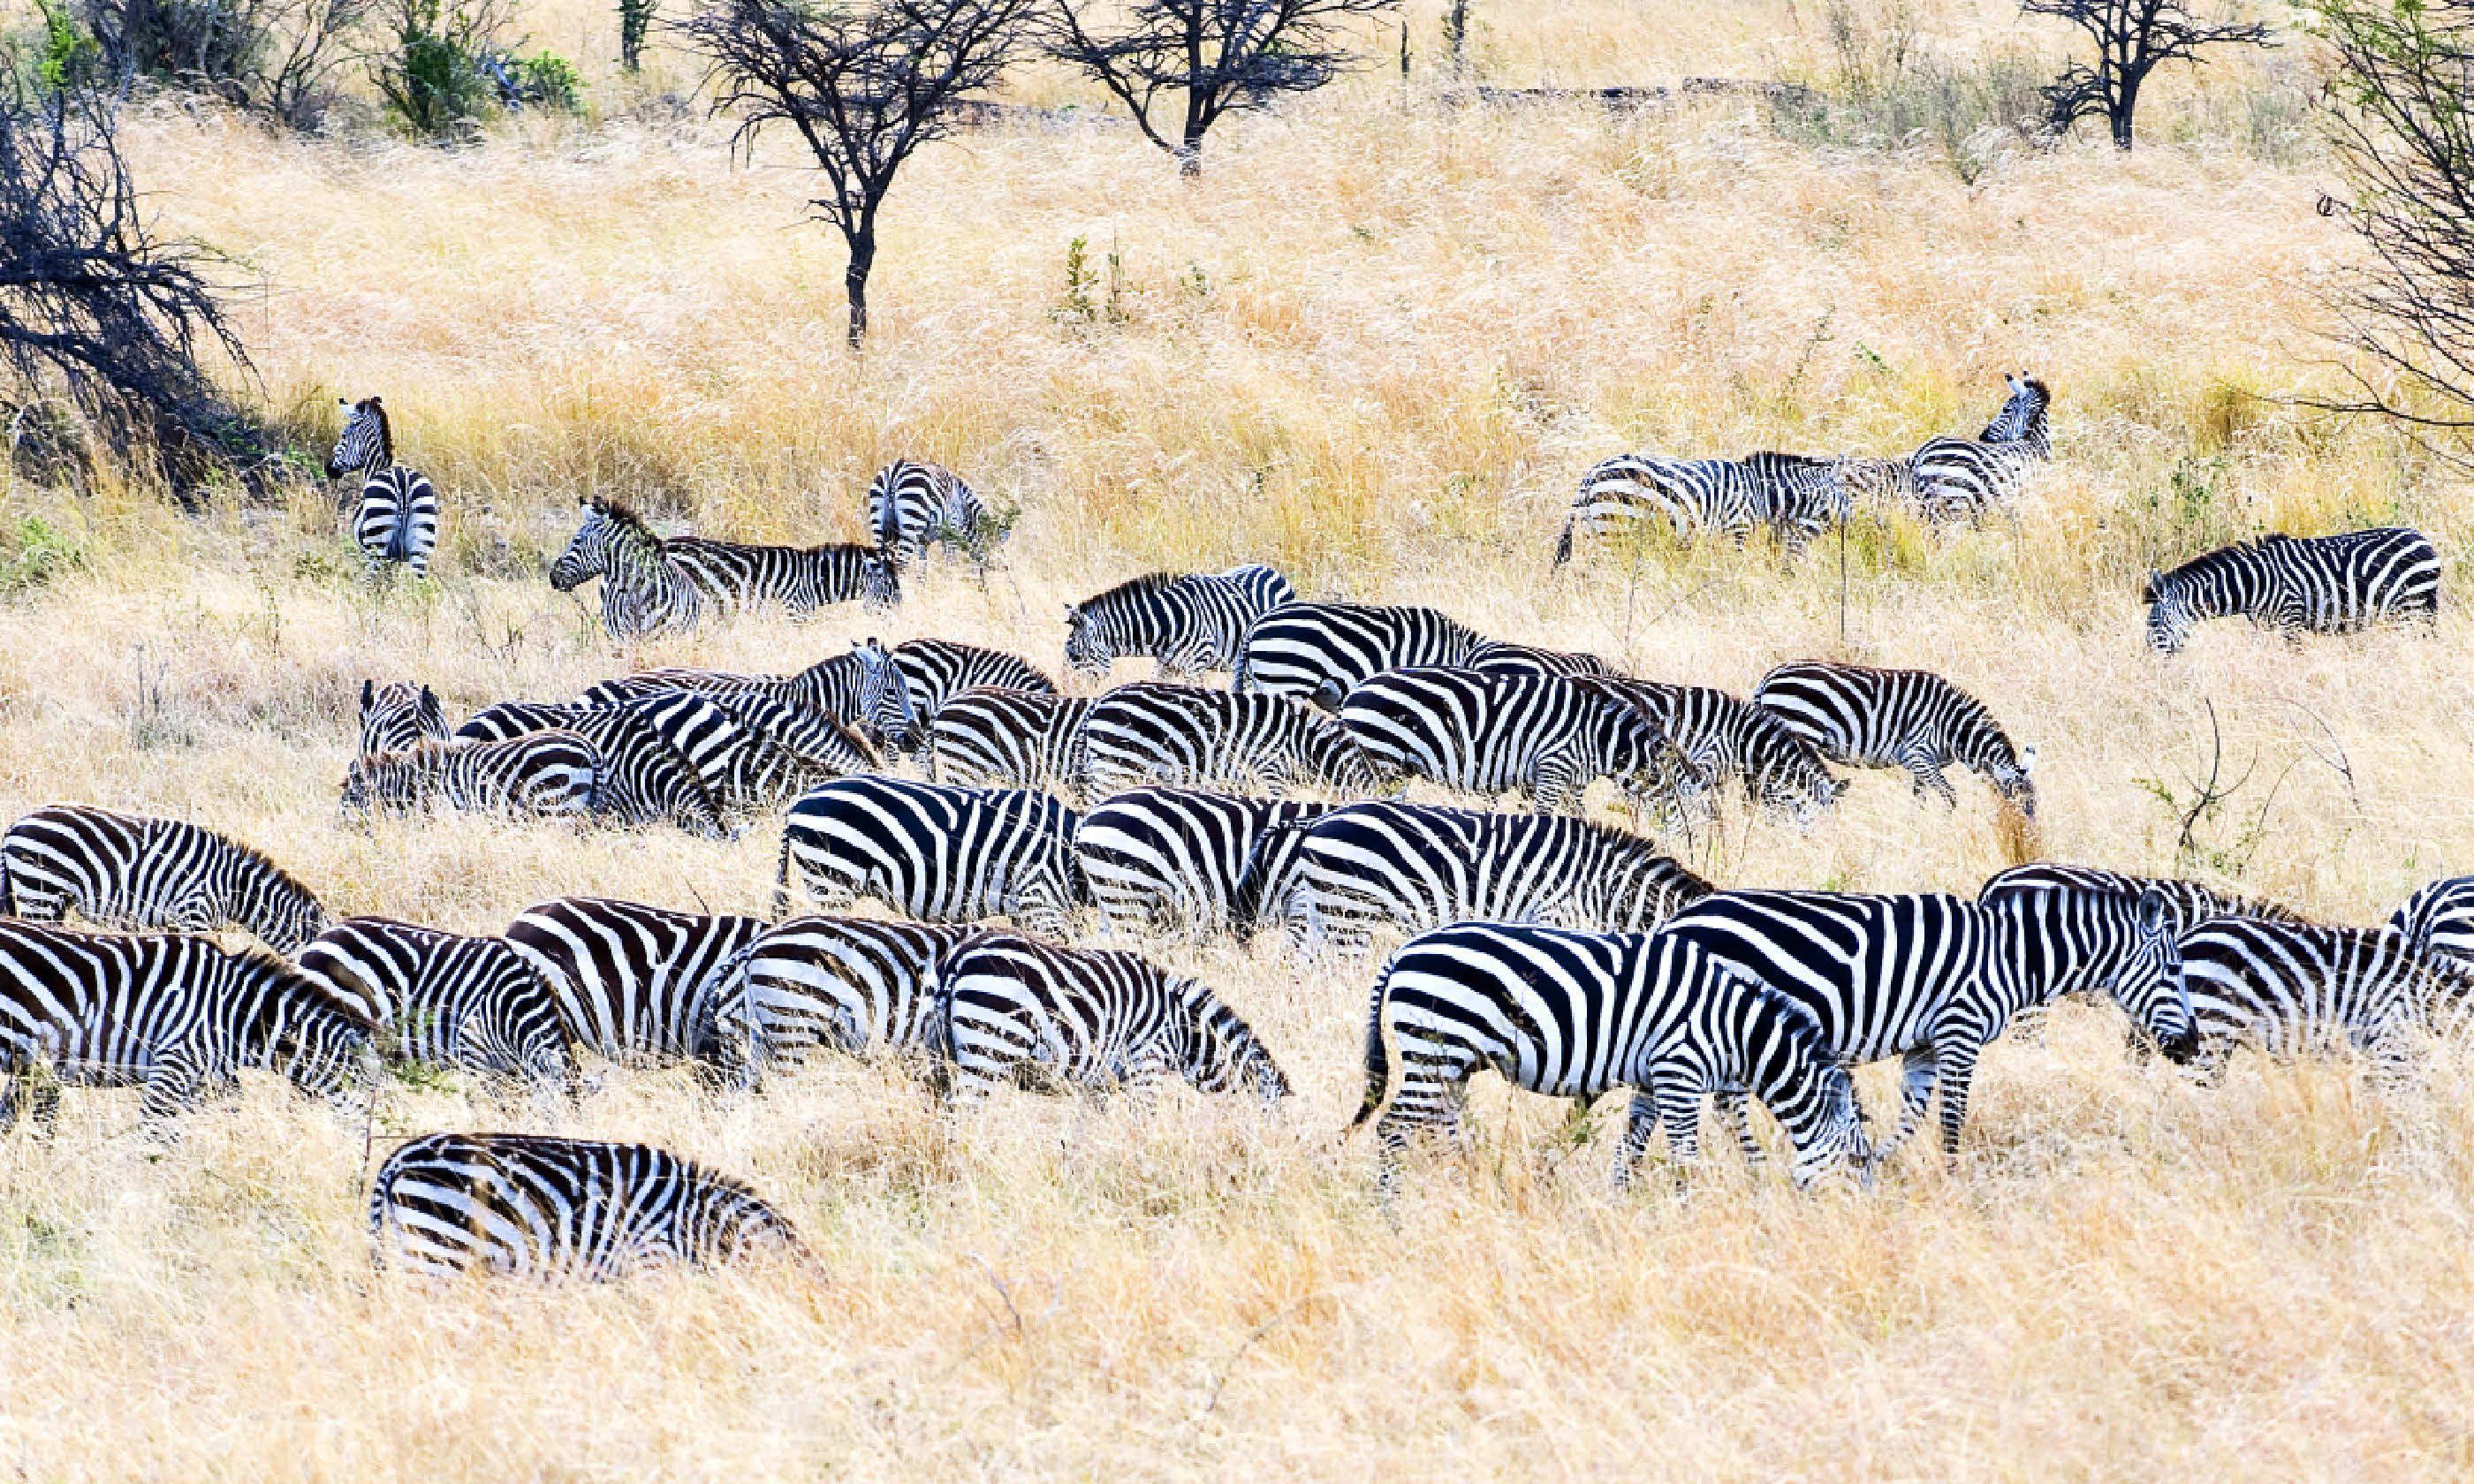 Serengeti National Park, Seronera area (Shutterstock)